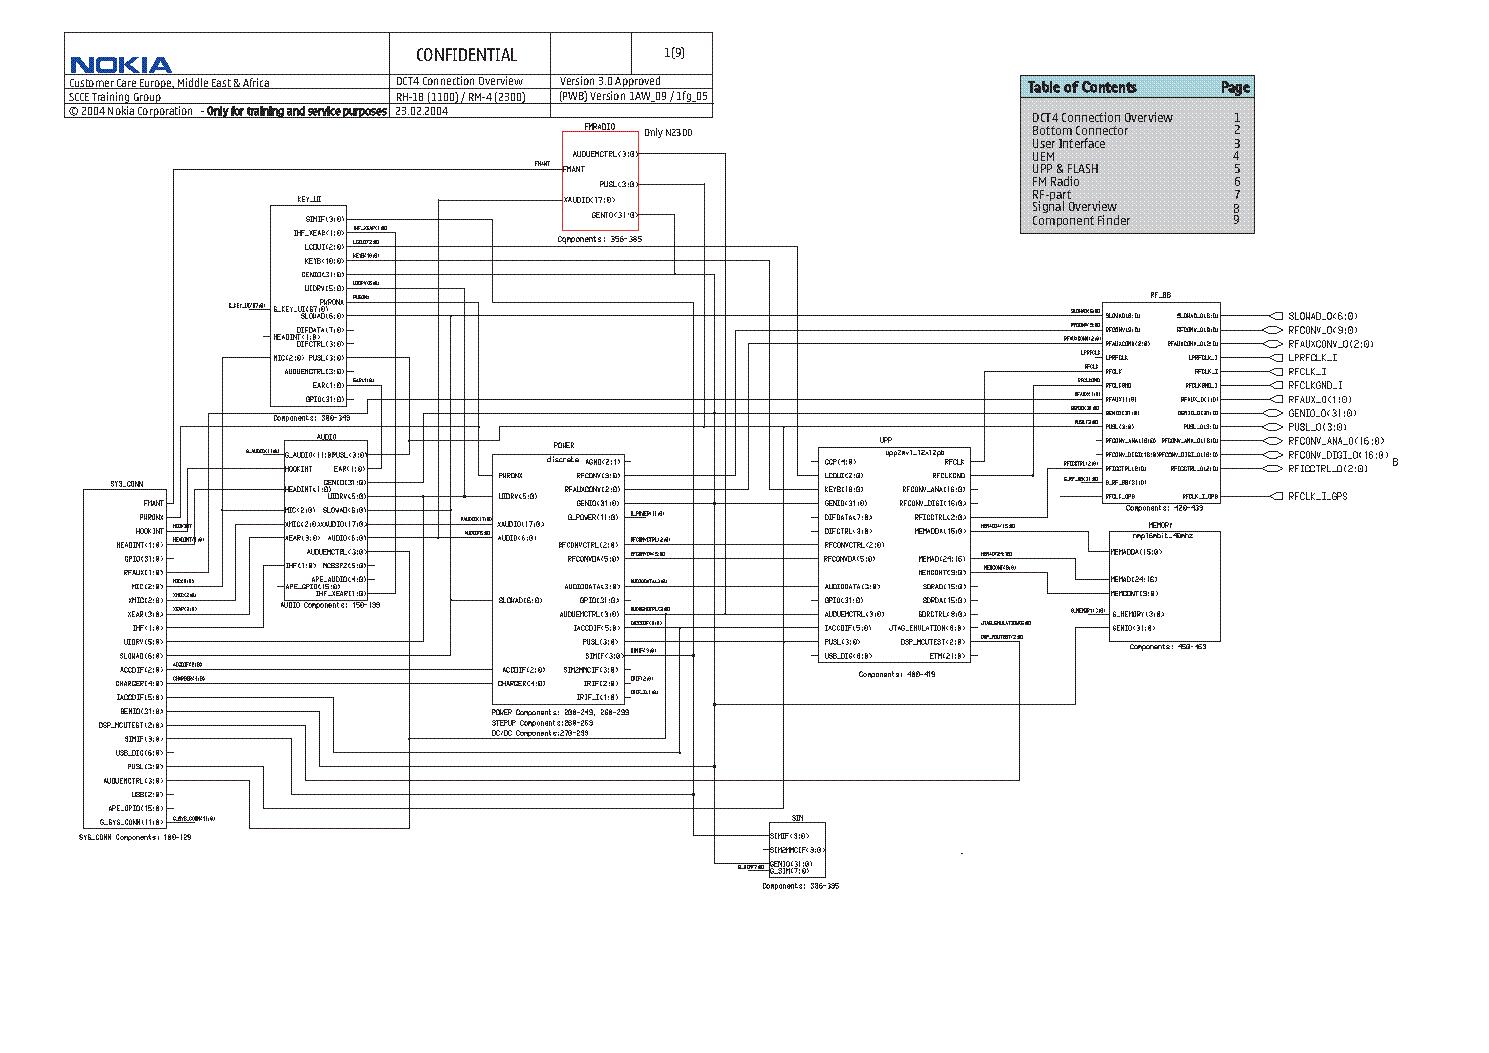 Nokia 206 Schematic Diagram Free Download: Nokia Hs 23 Wiring Diagram - Wiring  Diagram and